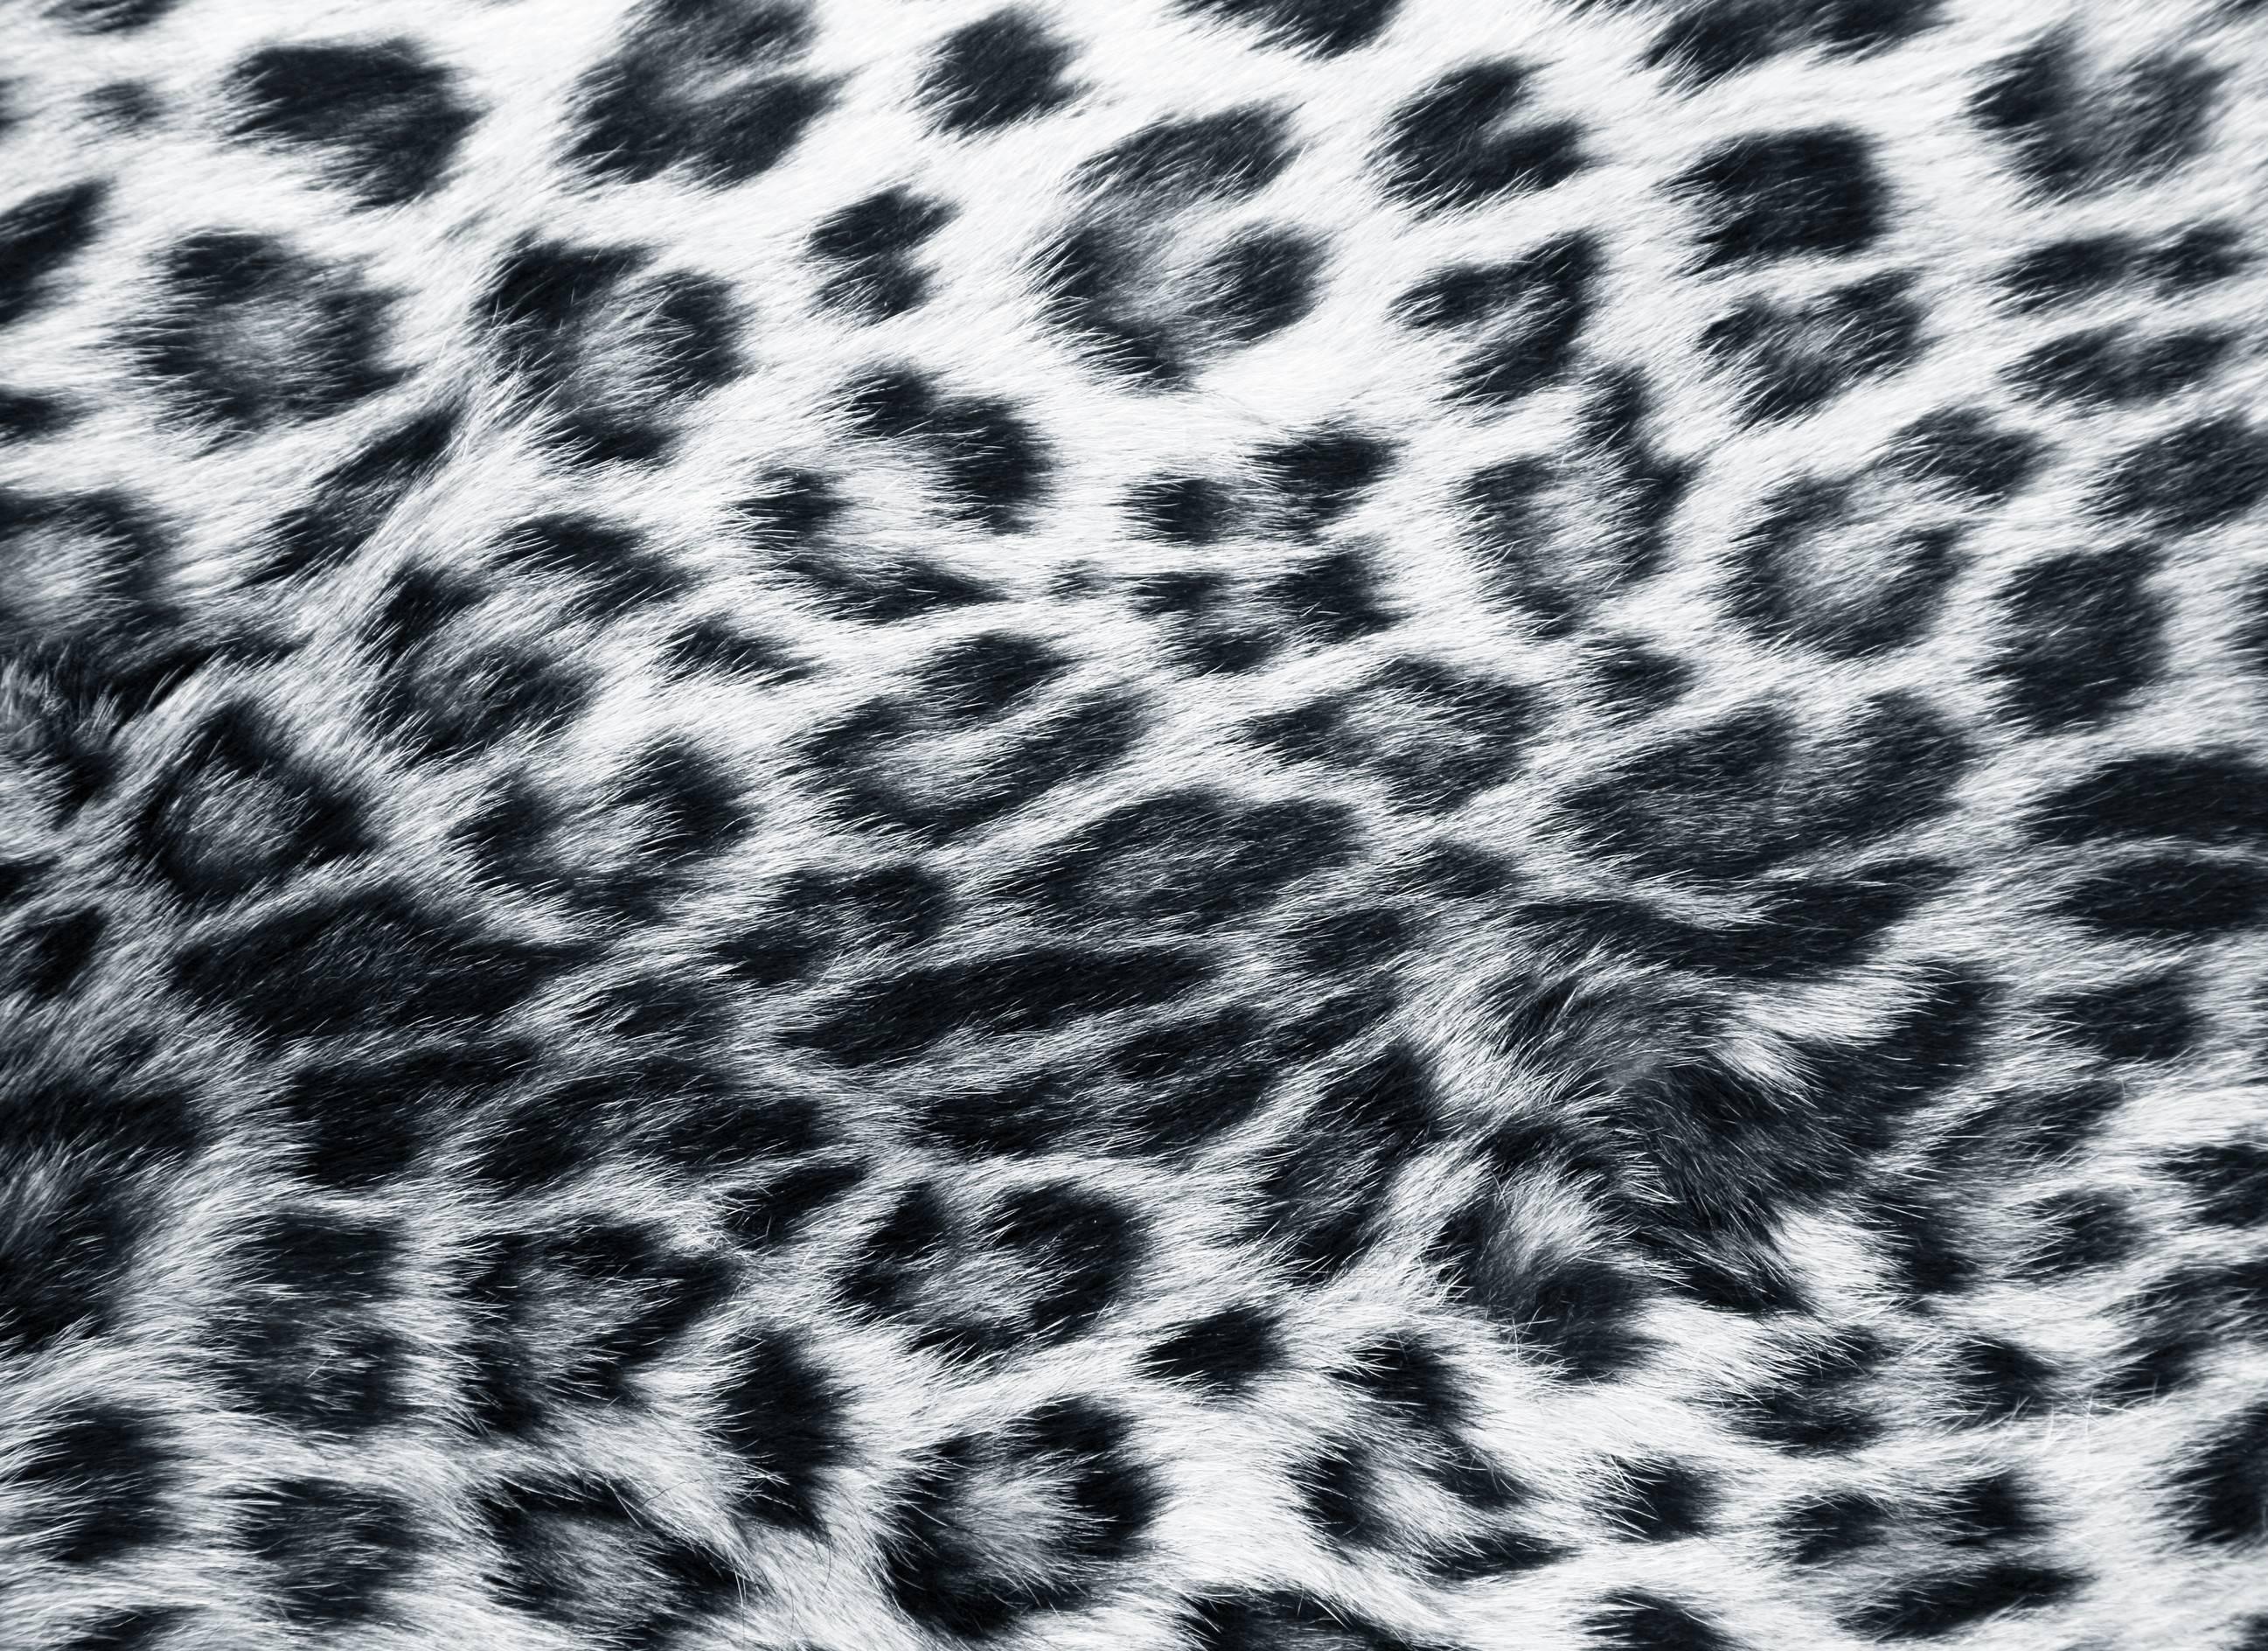 white cheetah wallpaper hd - photo #17